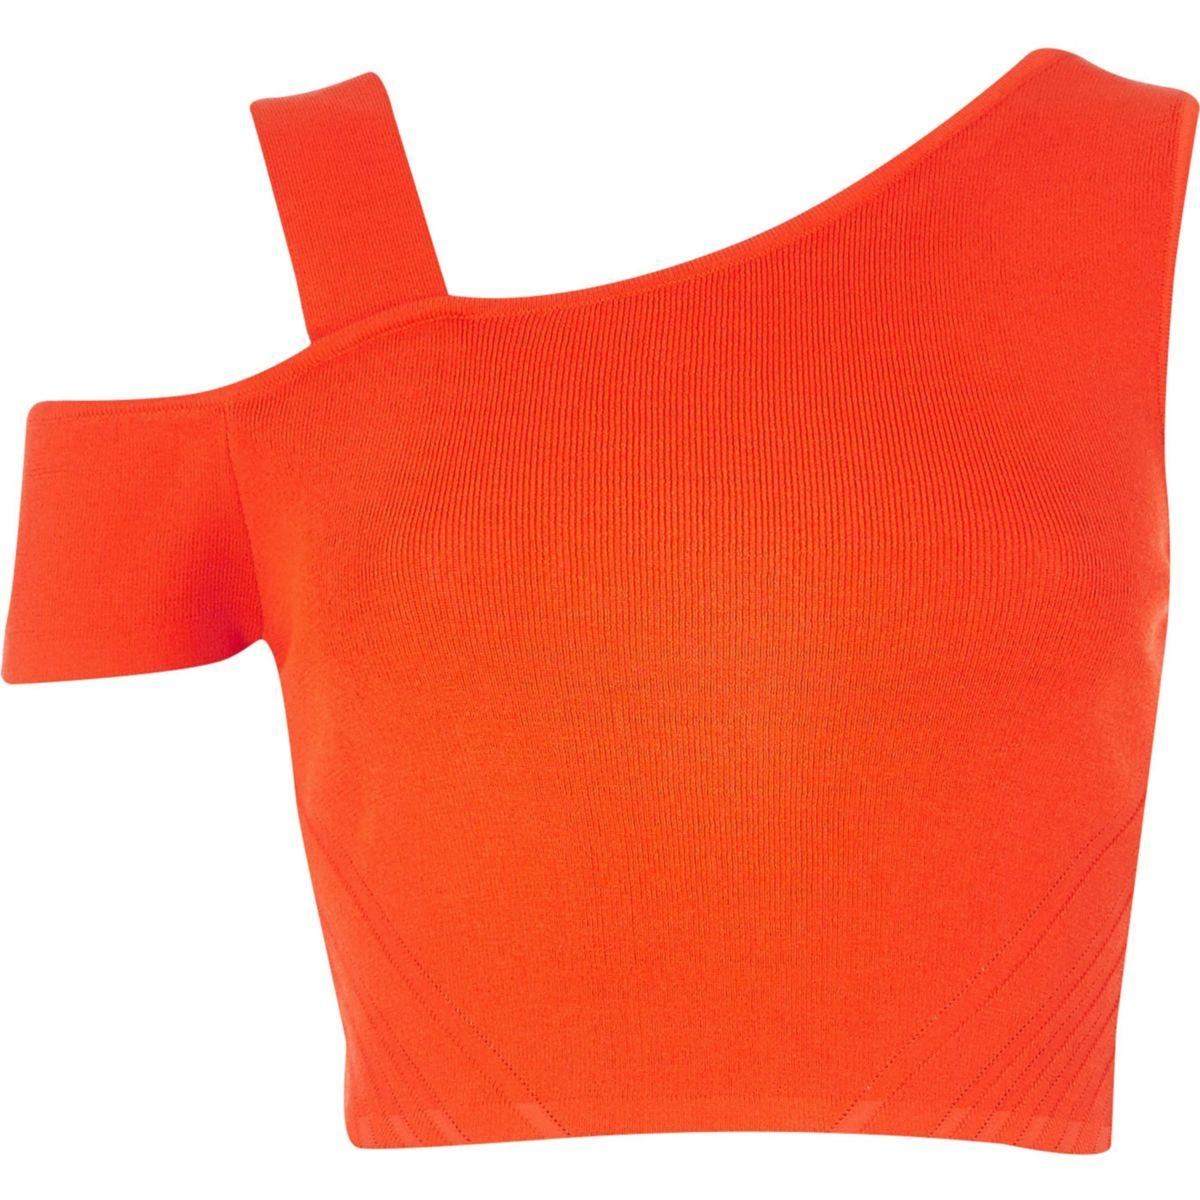 Red asymmetric cold shoulder crop top